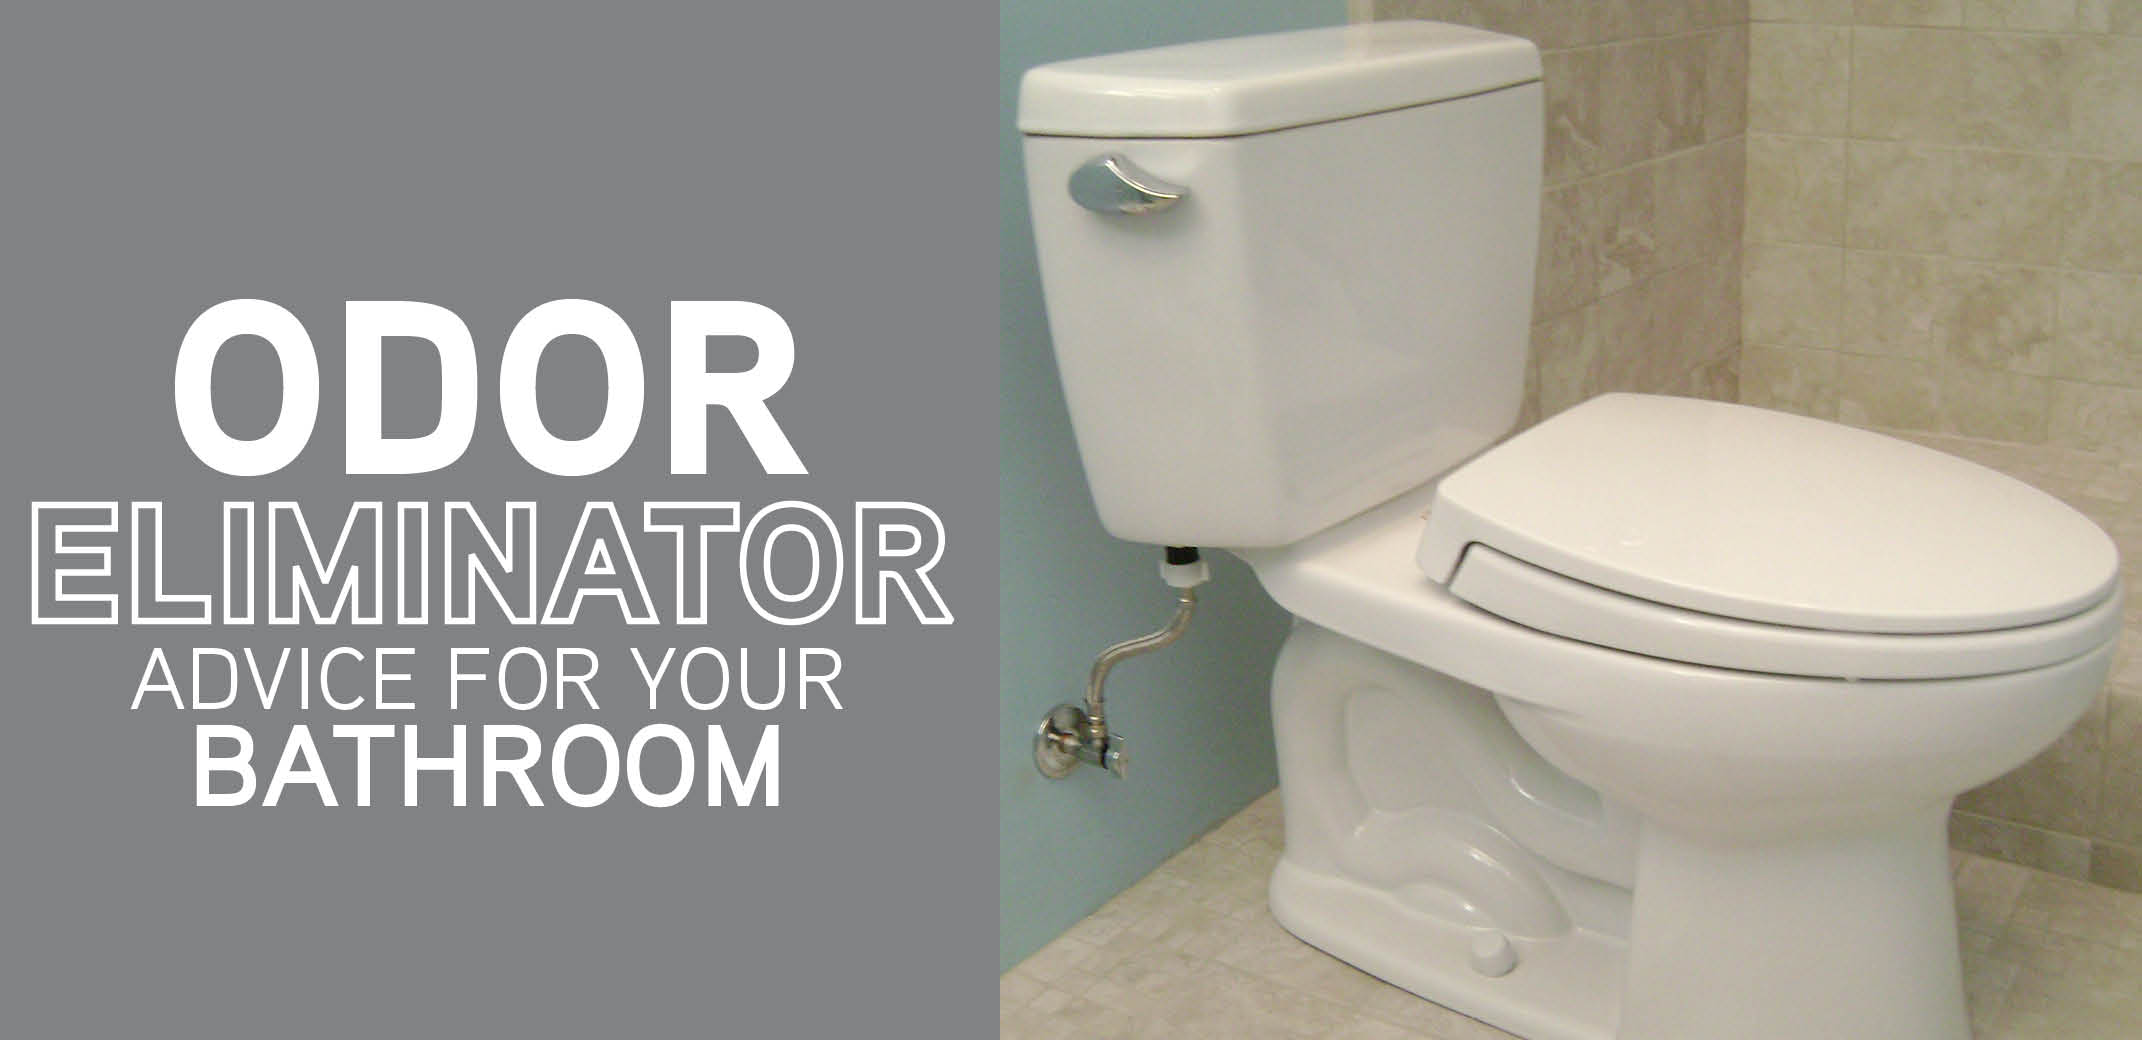 Odor Eliminator Advice For Your Bathroom Mr Rooter